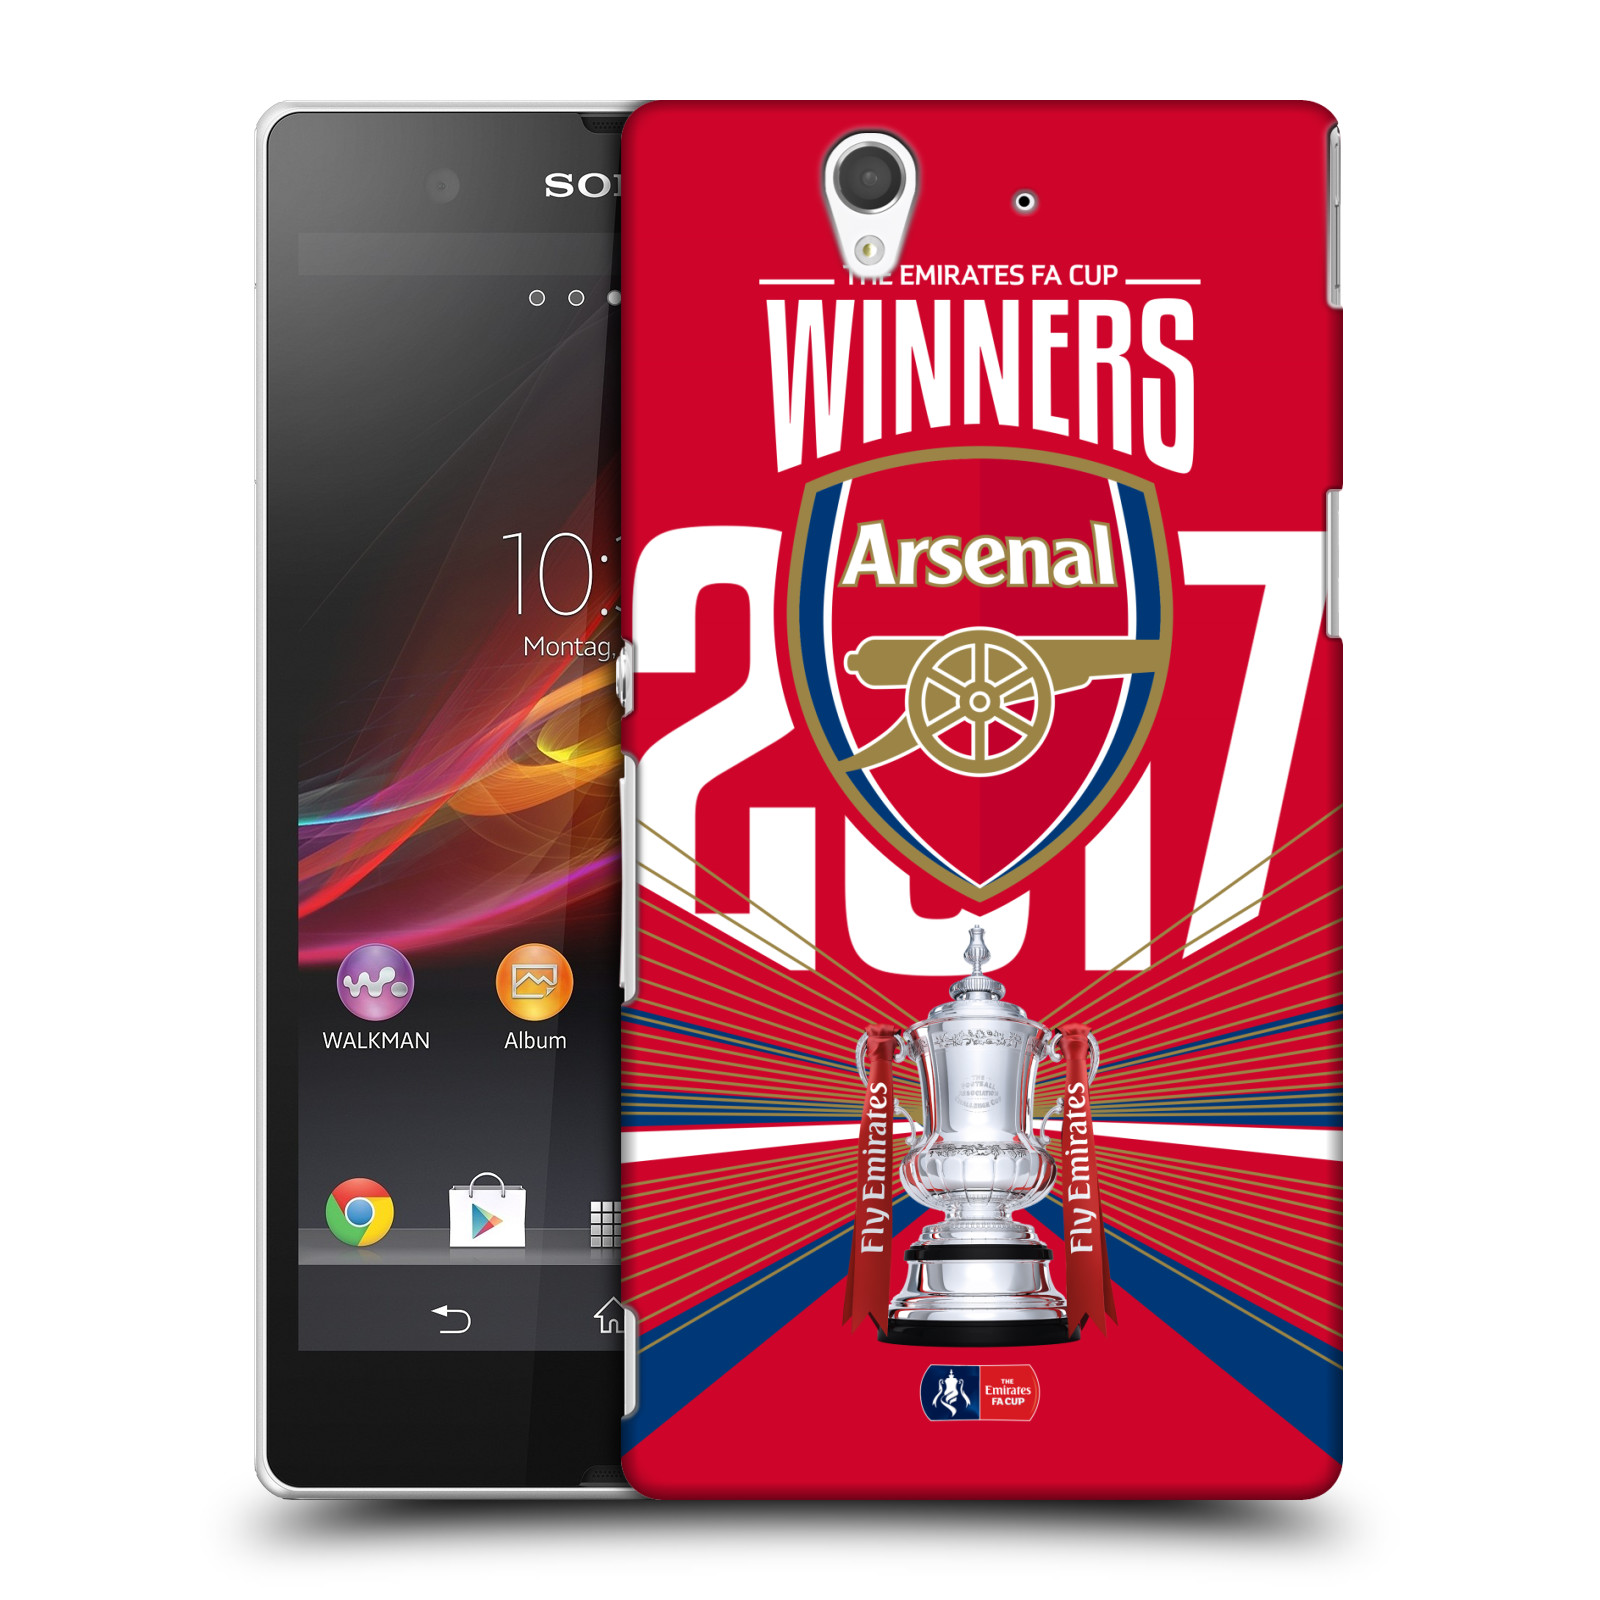 Plastové pouzdro na mobil Sony Xperia Z C6603 - Head Case - Arsenal FC - Trophy